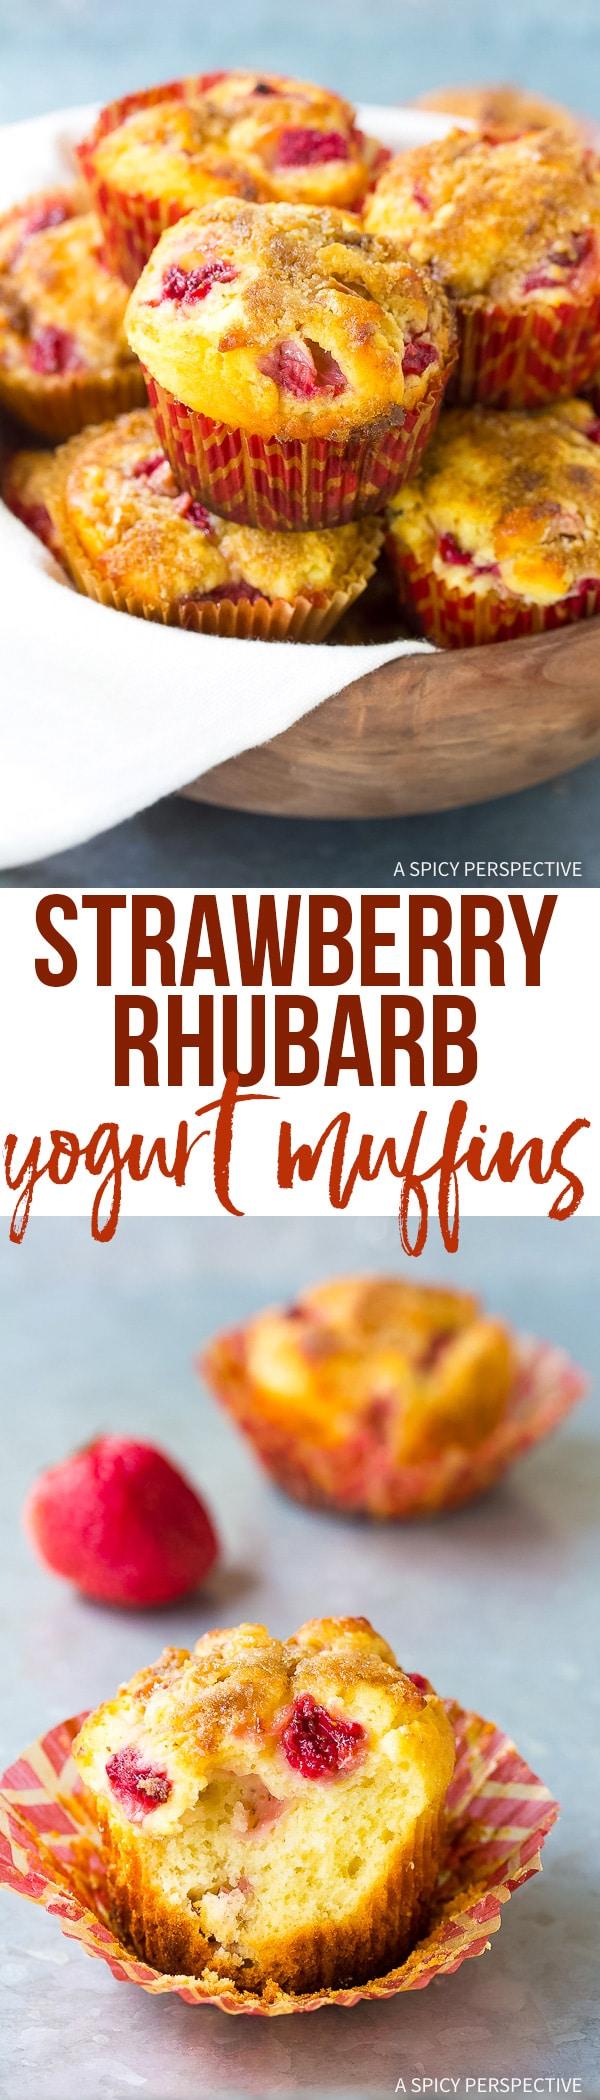 The Best Strawberry Rhubarb Yogurt Muffins Recipe